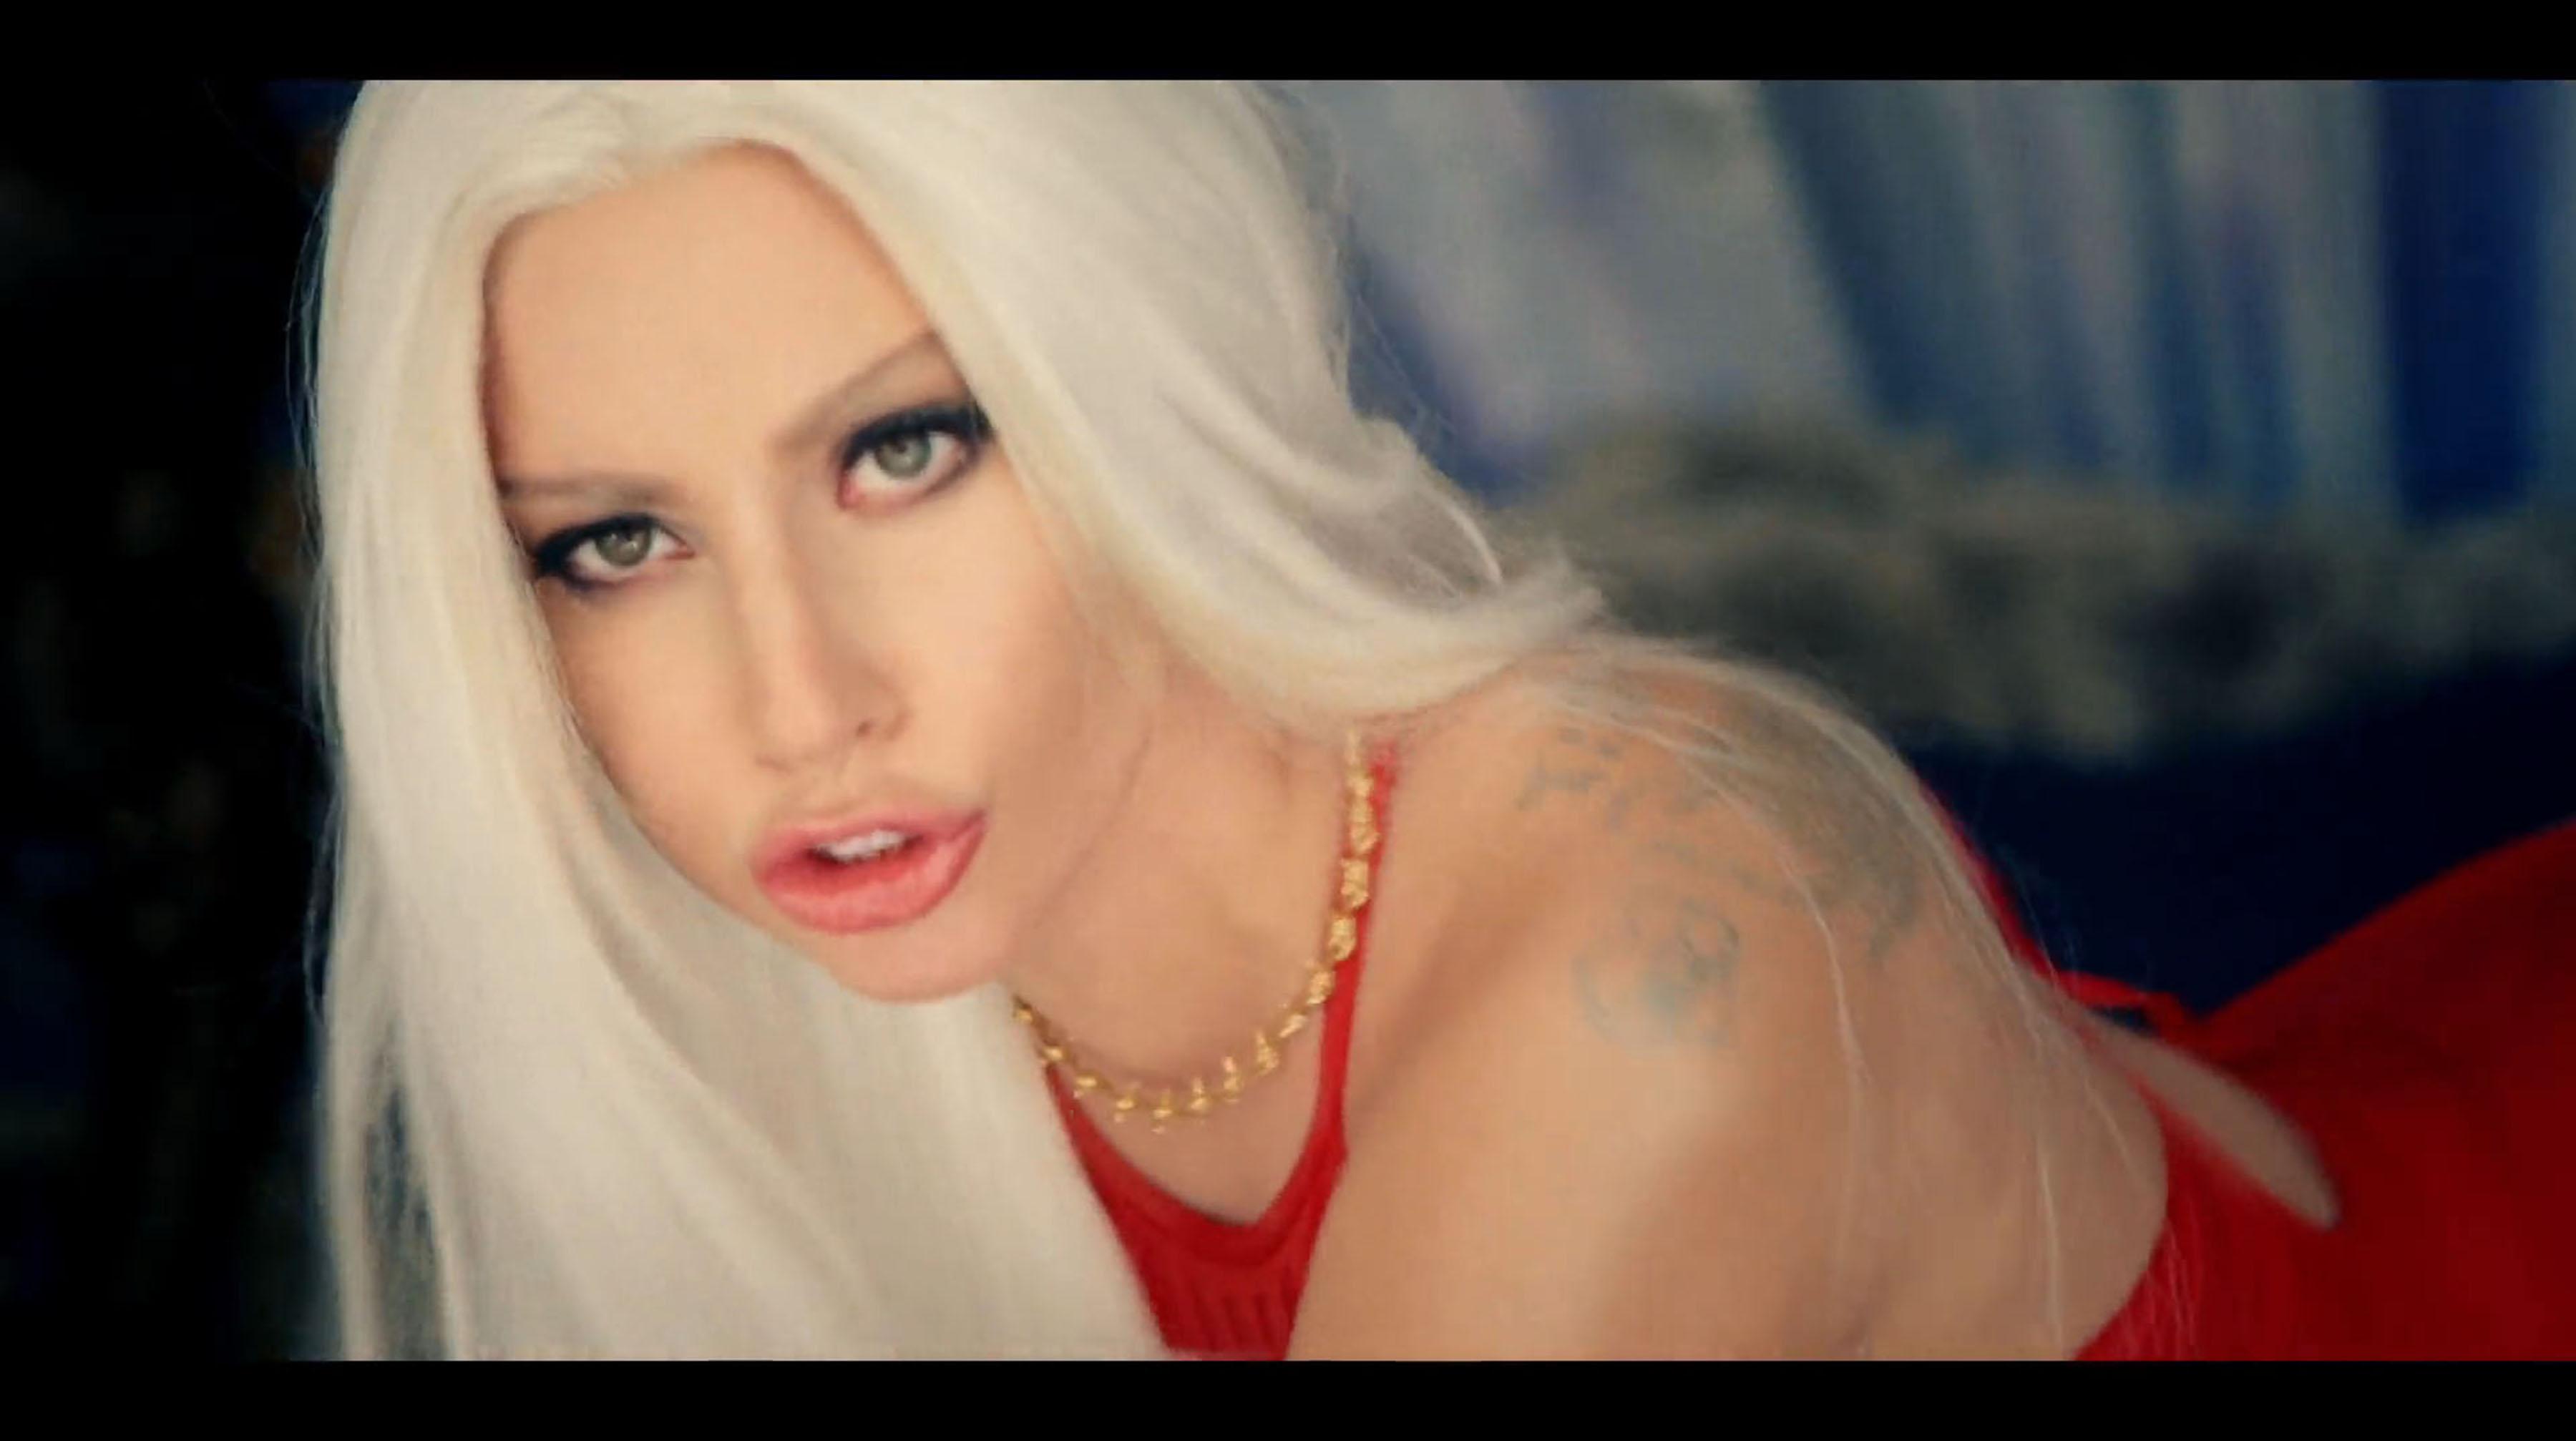 Lady Gaga Guy Music Video Makeup Tutorial  Beausic-9341